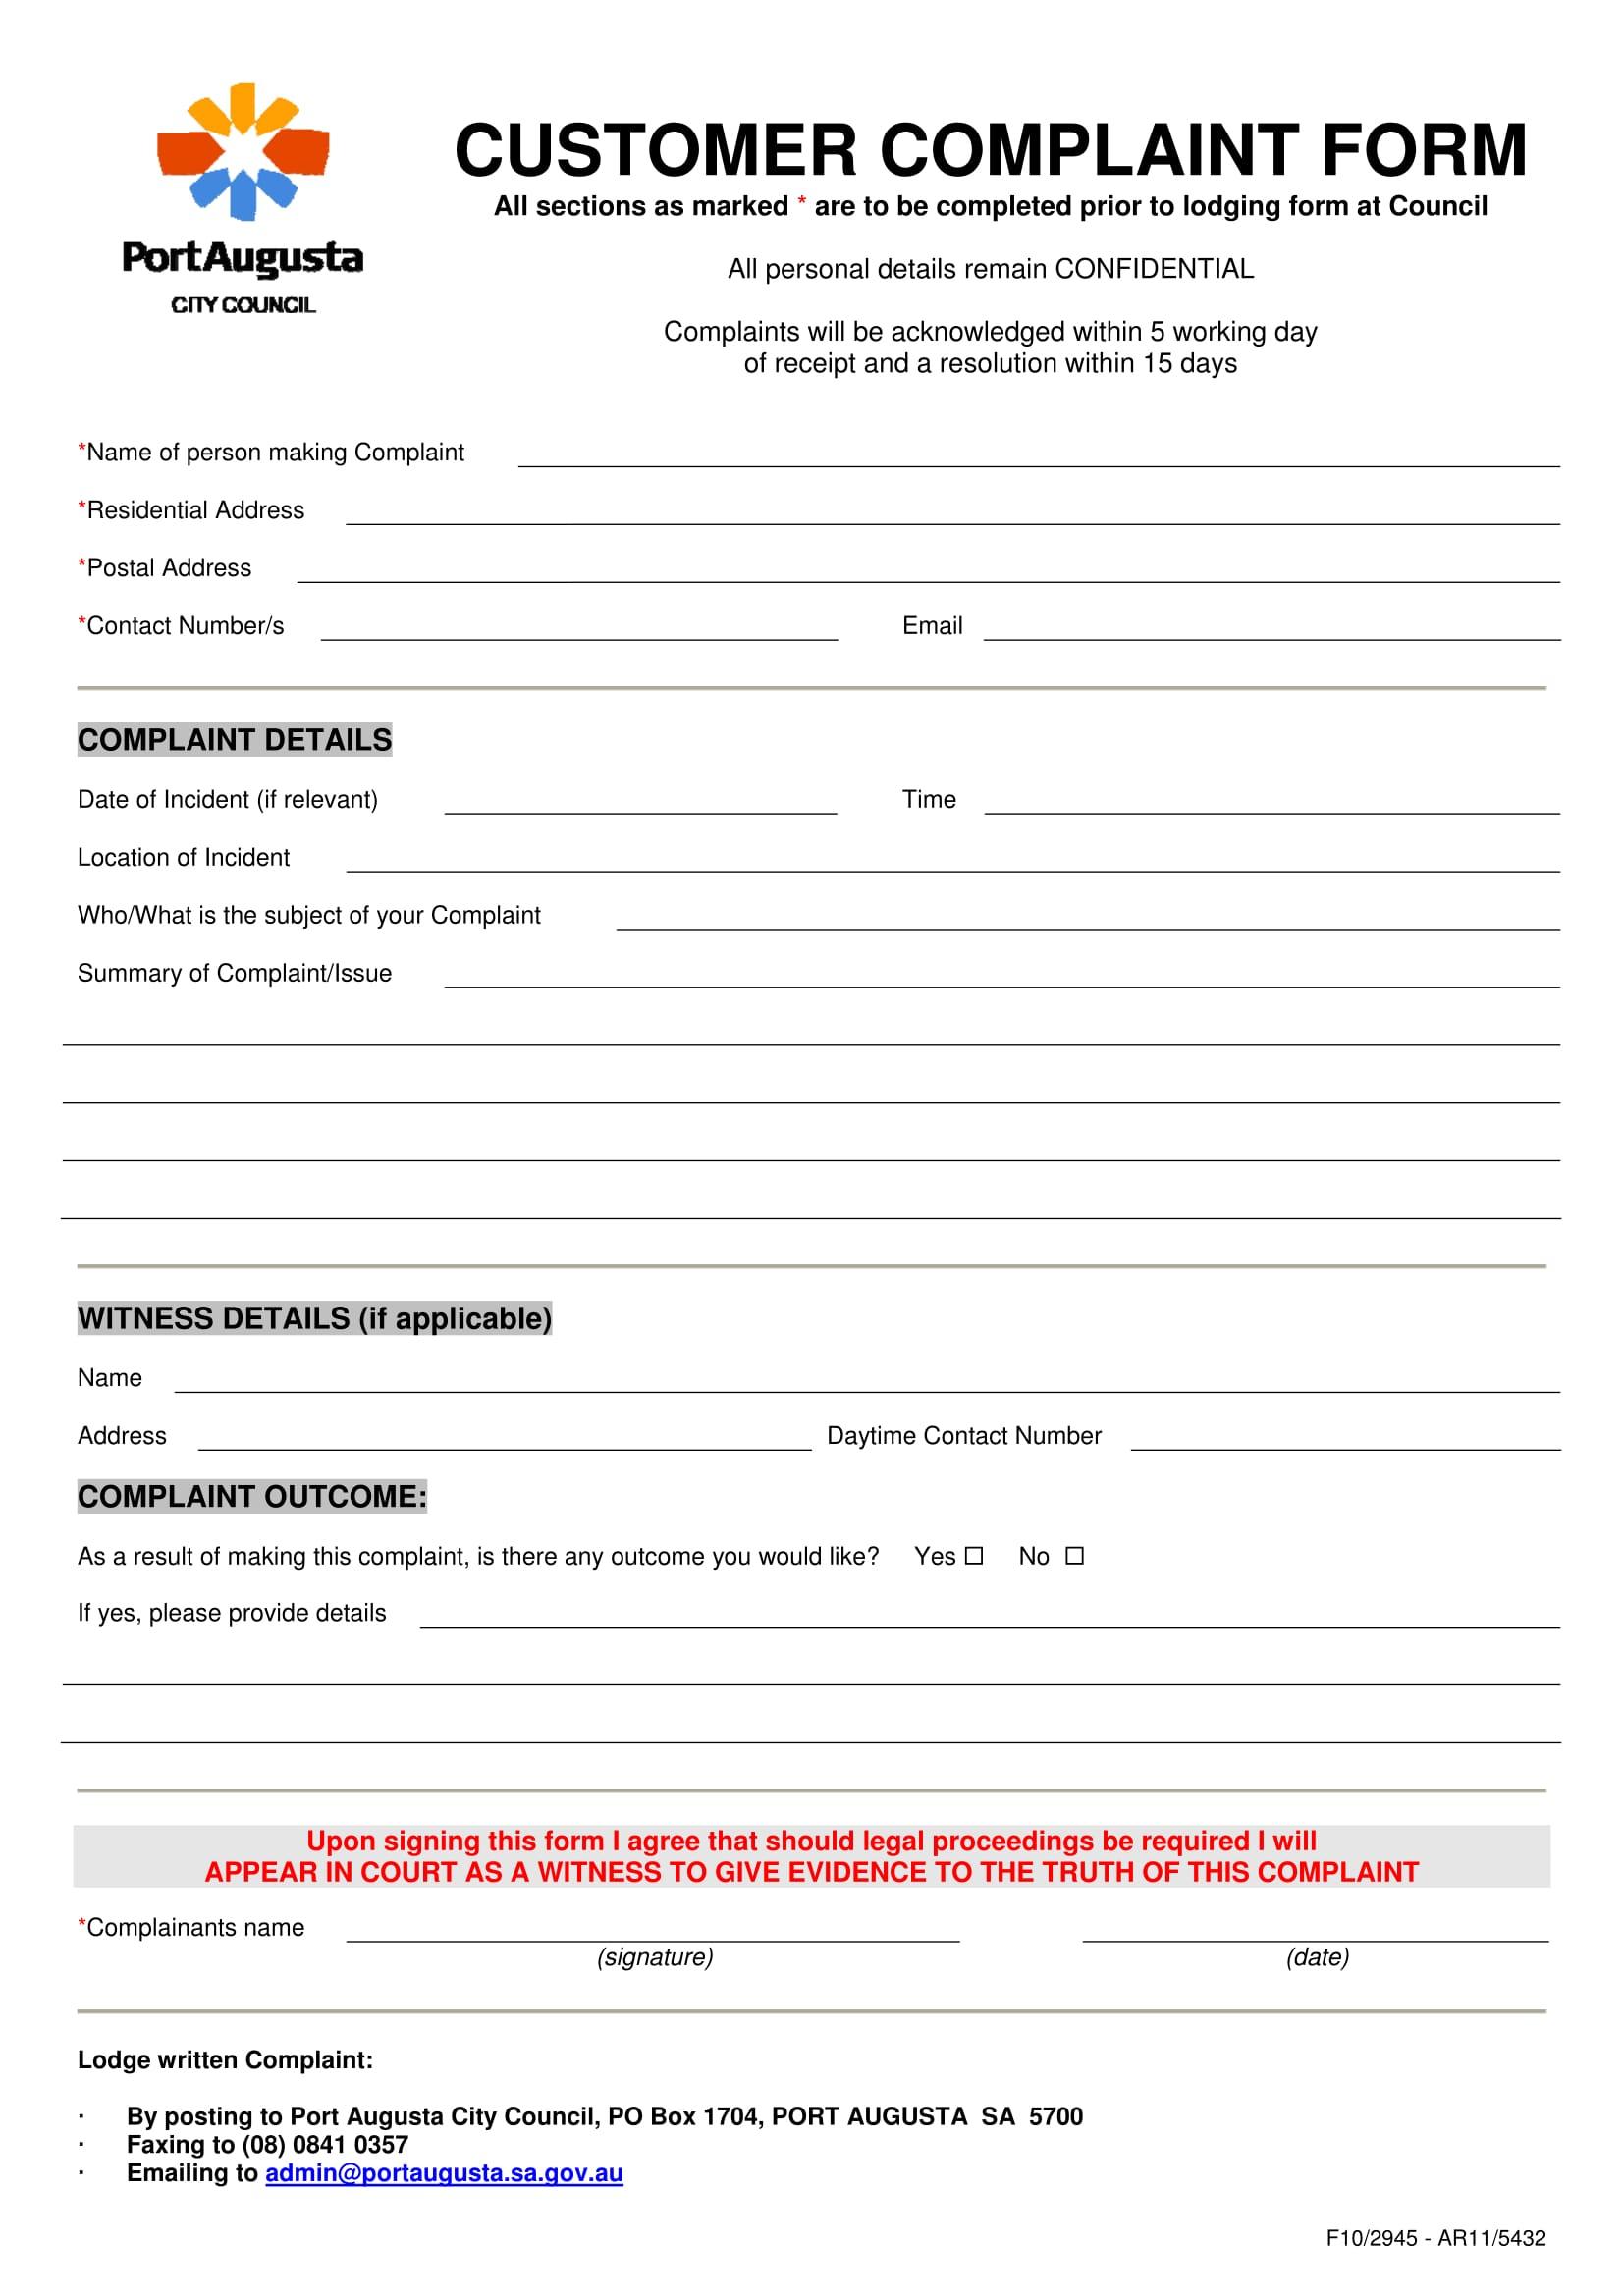 council customer complaint form 1